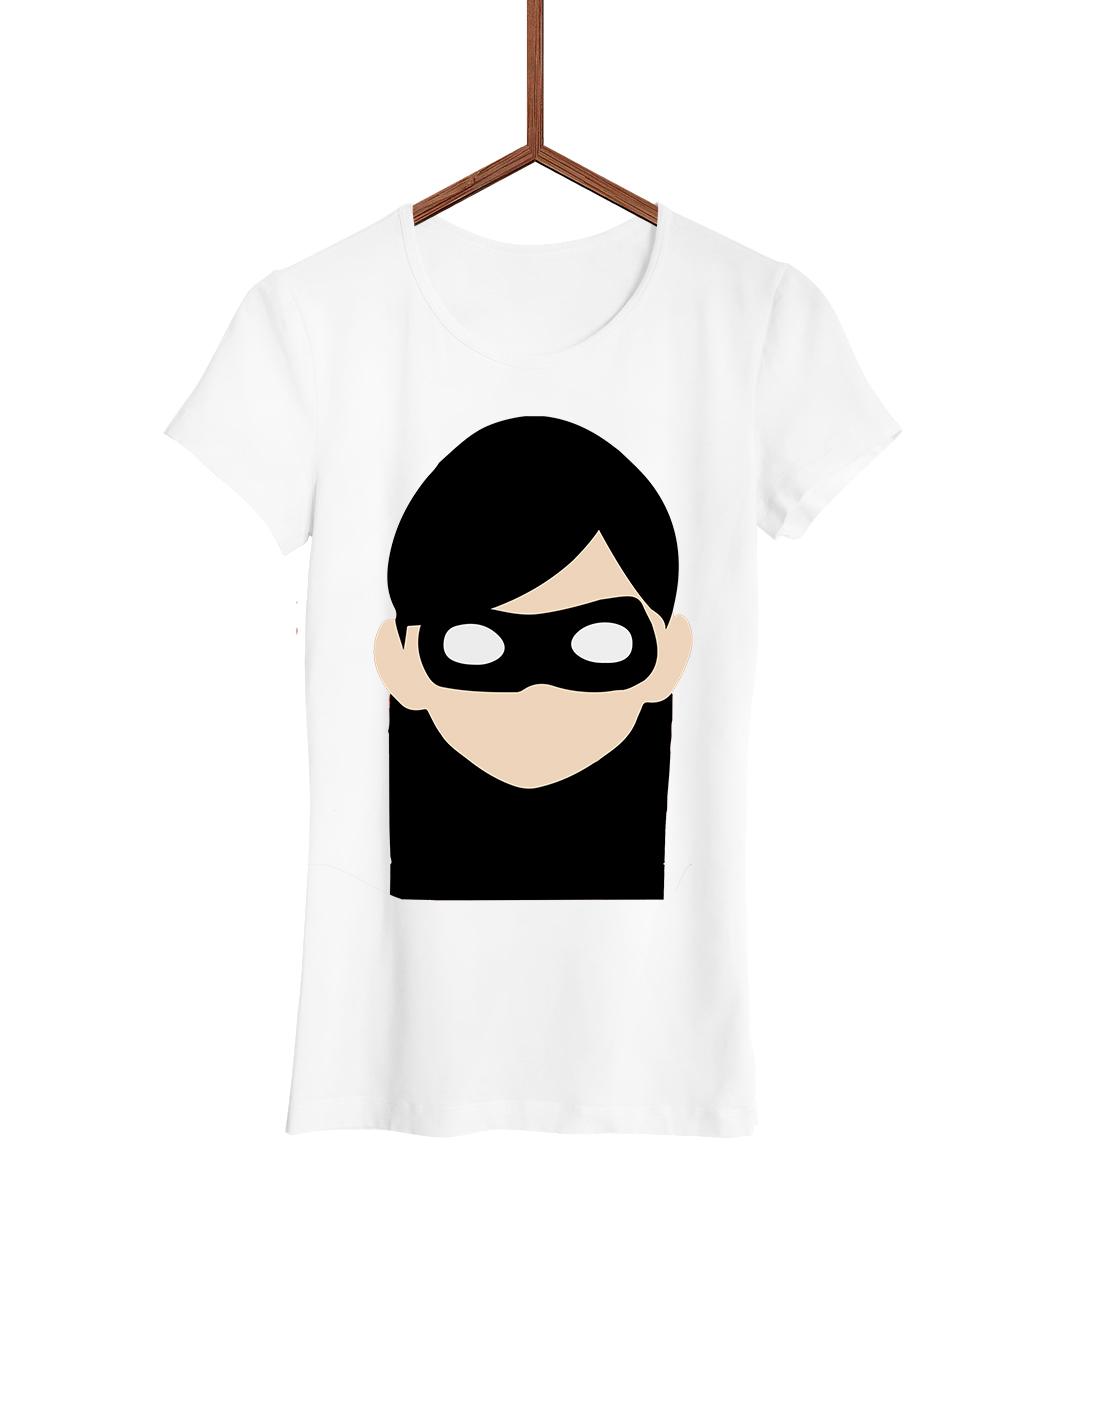 42859e200c5b1 T-shirt Violett tee Women · FailFake · Online Store Powered by Storenvy